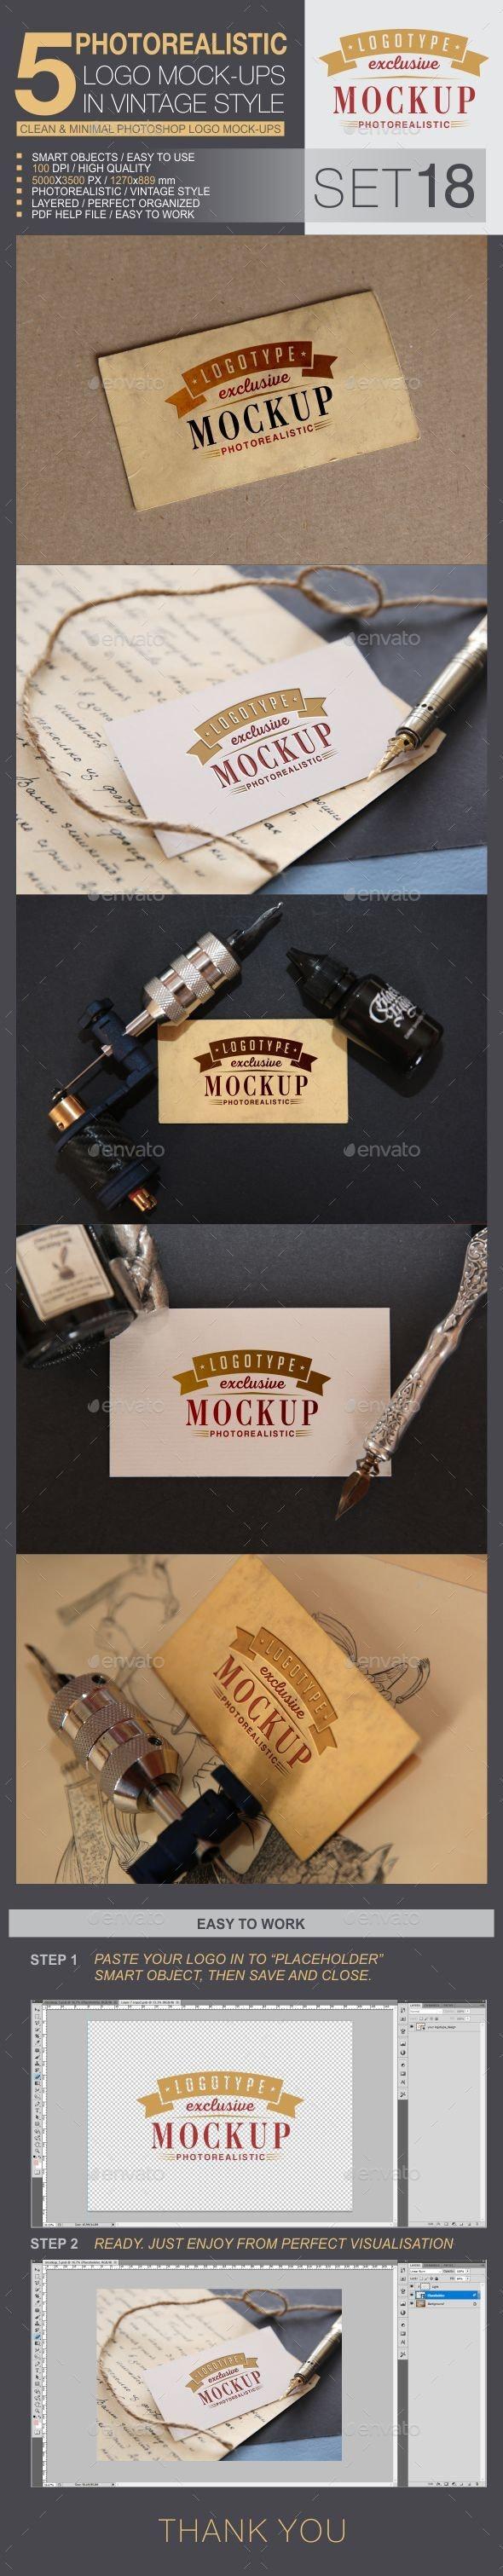 5 Logo Mock-Ups In Vintage Style - Set 18 - Logo Product Mock-Ups